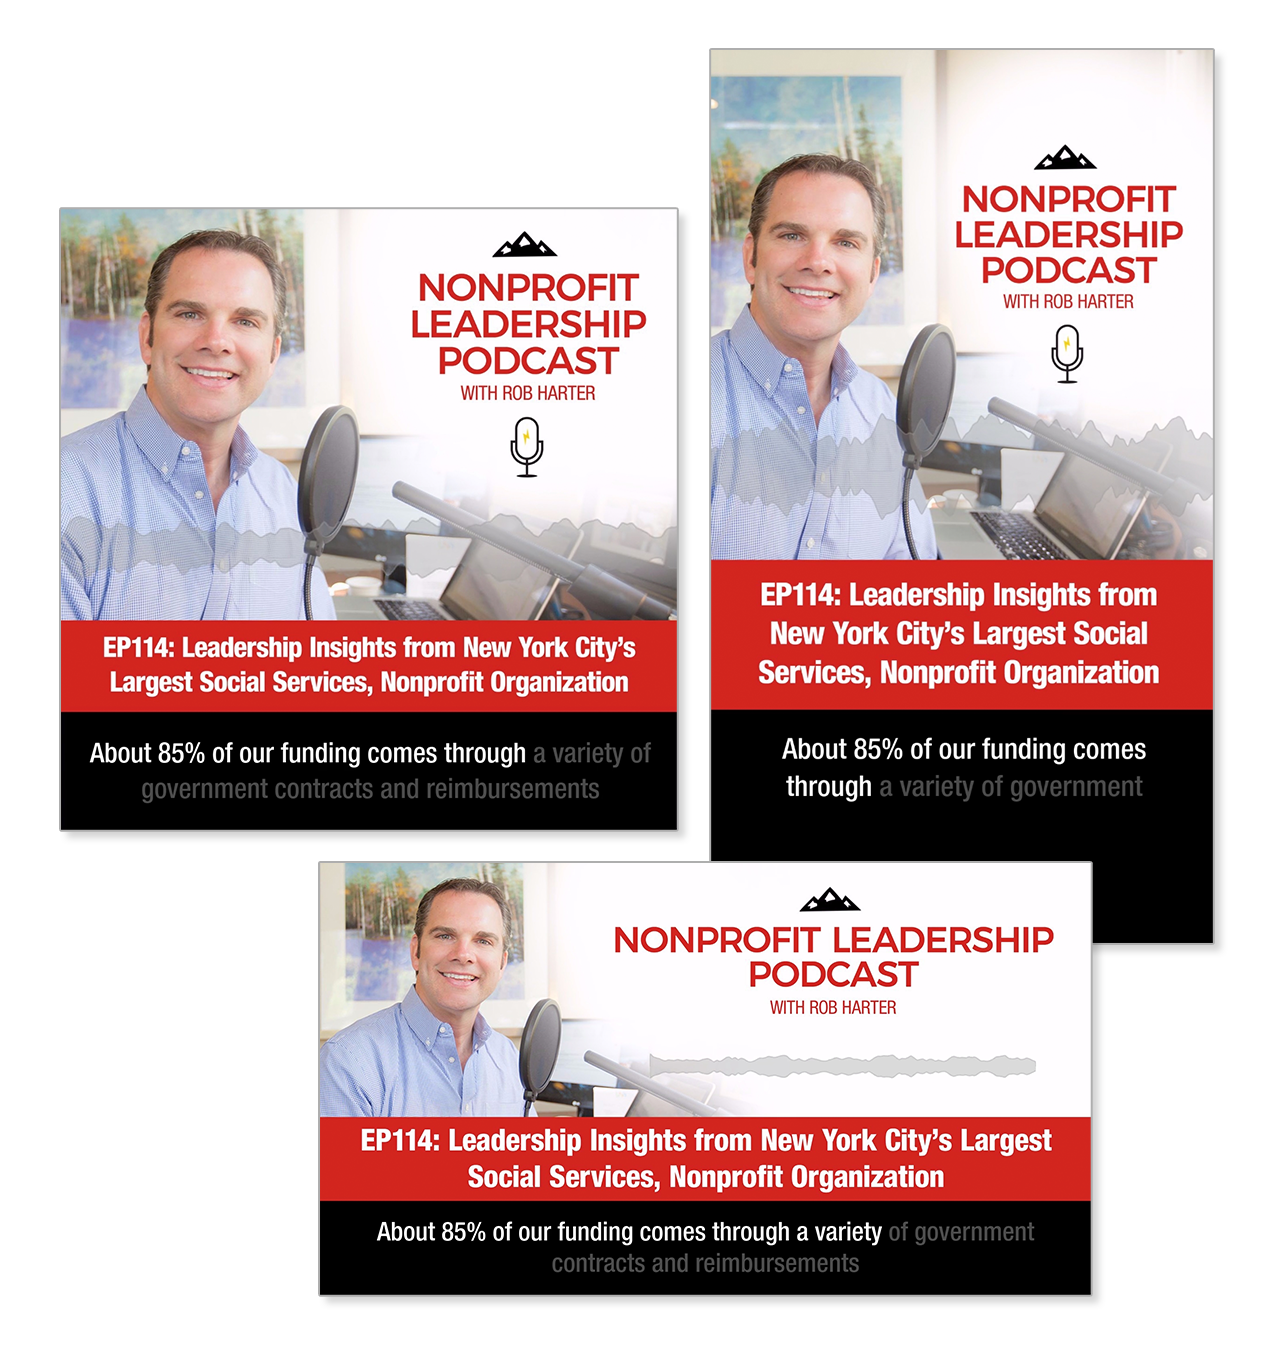 Nonprofit Leadership Podcast